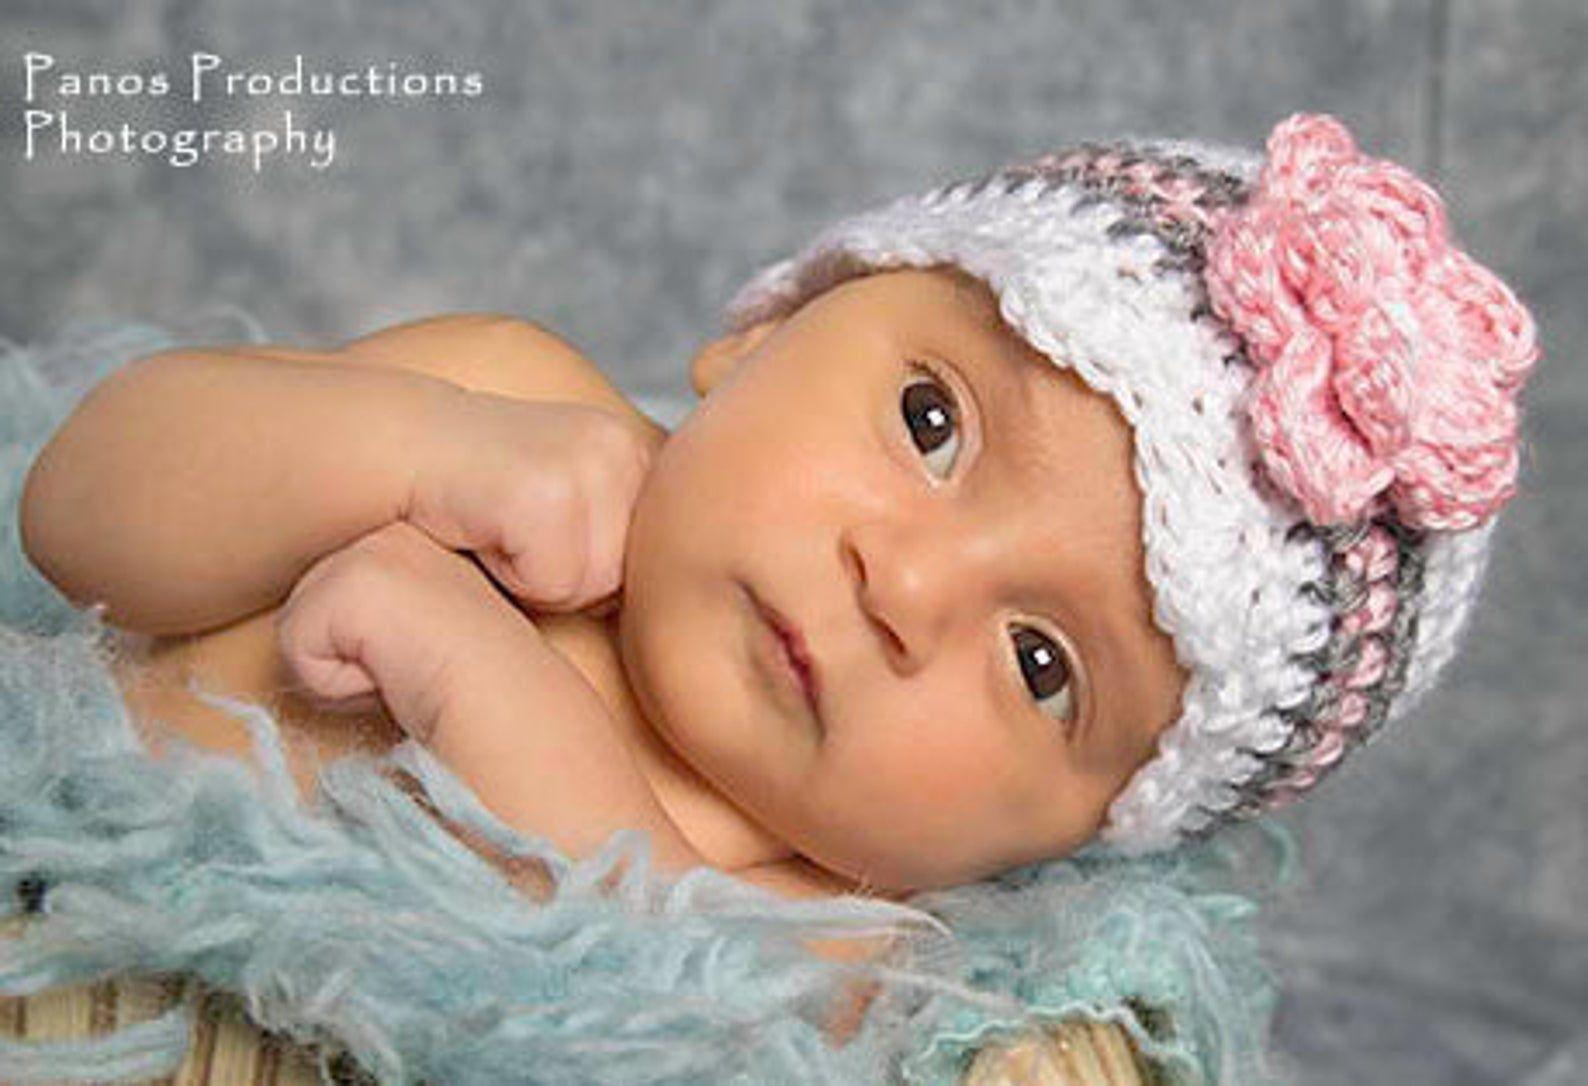 Crochet Toddler Hat White Coming Home Hat Crochet Striped Baby Girl Beanie Pink Crochet Baby Hat Newborn Photo Prop Baby Shower Gift